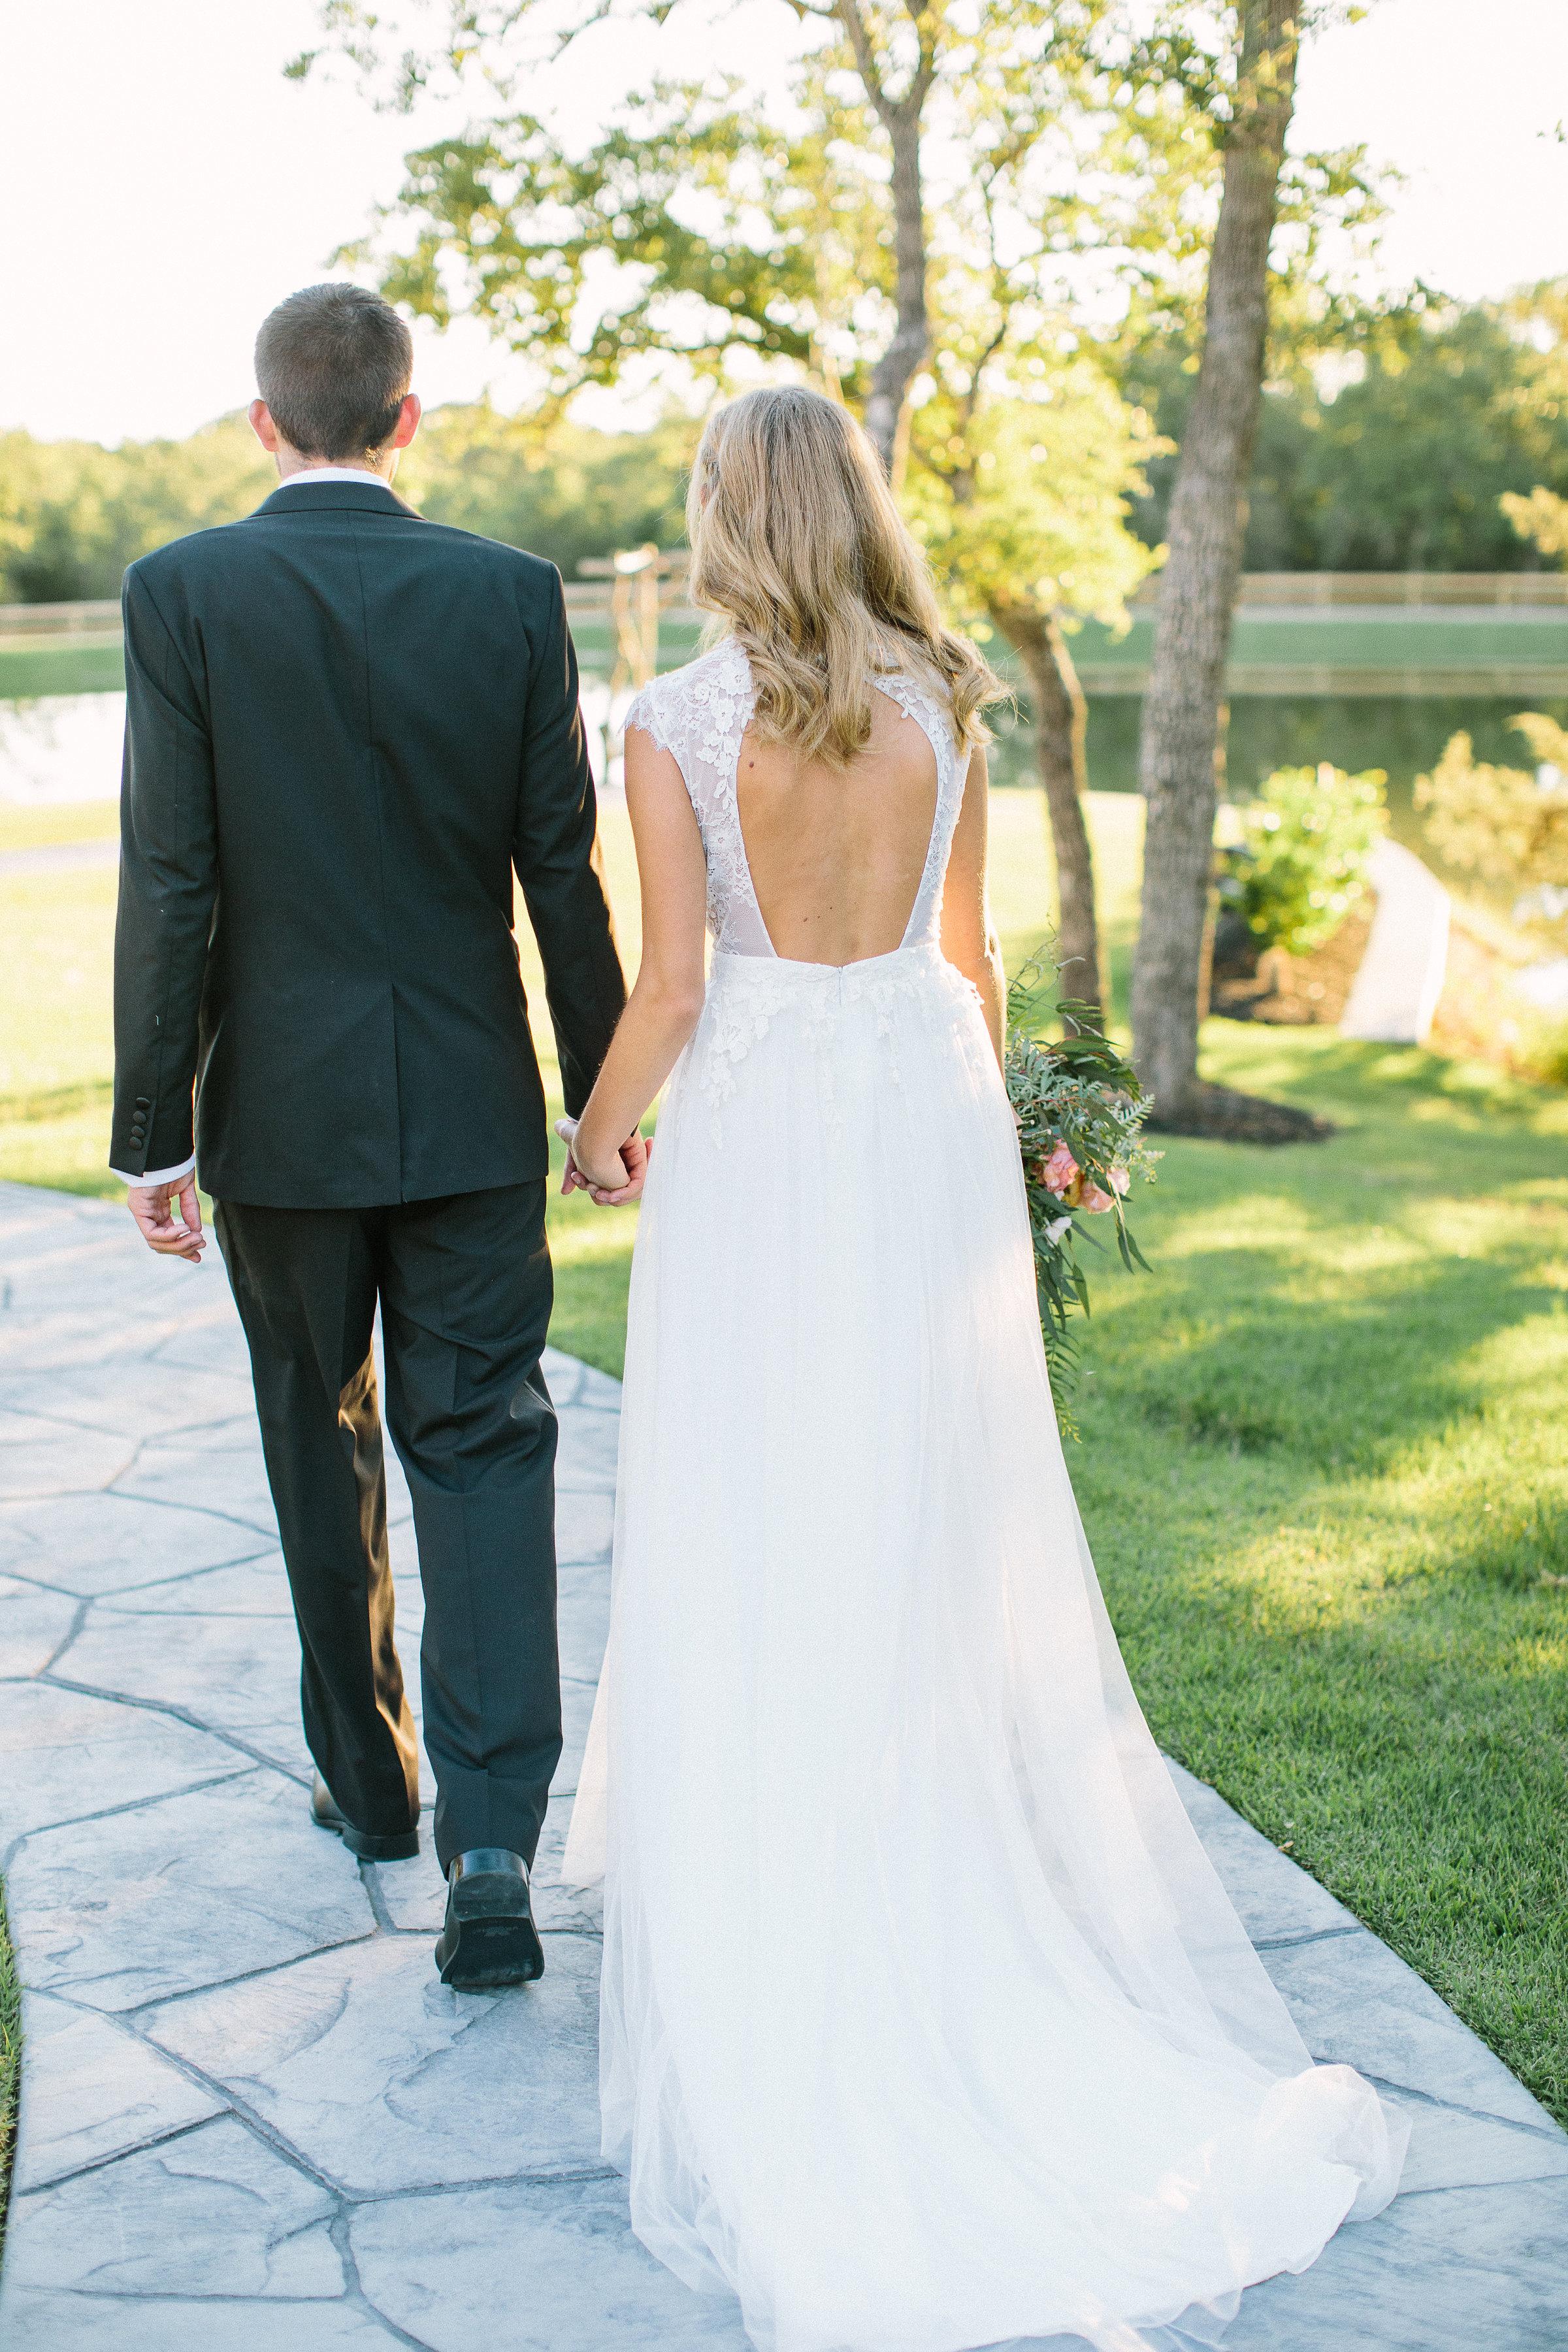 Ellen-Ashton-Photography-Peach-Creek-Ranch-Weddings-Wed-and-Prosper287